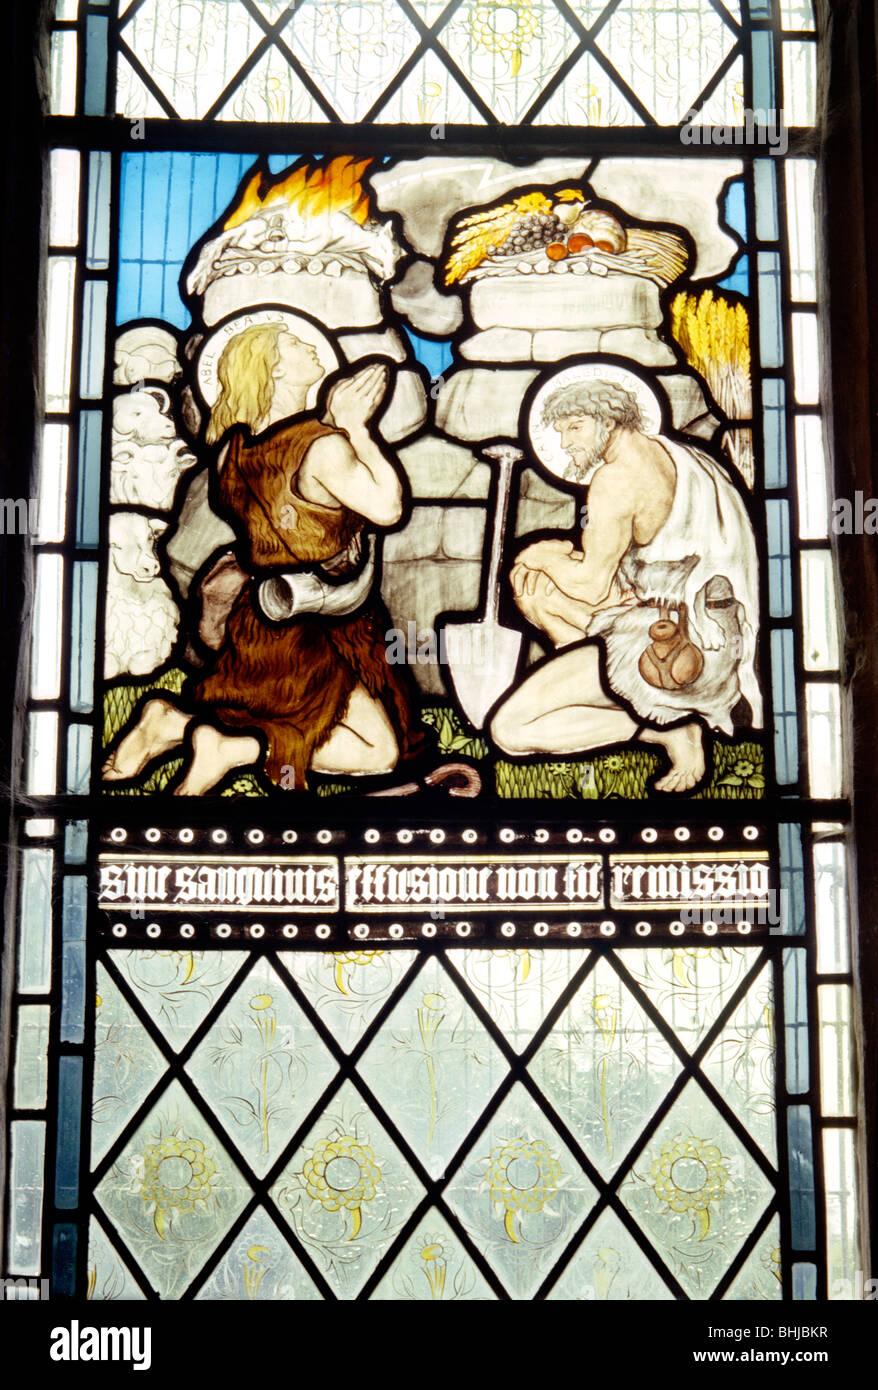 Window in All Saints' church, Middleton Cheney, Northamptonshire, 1963. Artist: Laurence Goldman - Stock Image